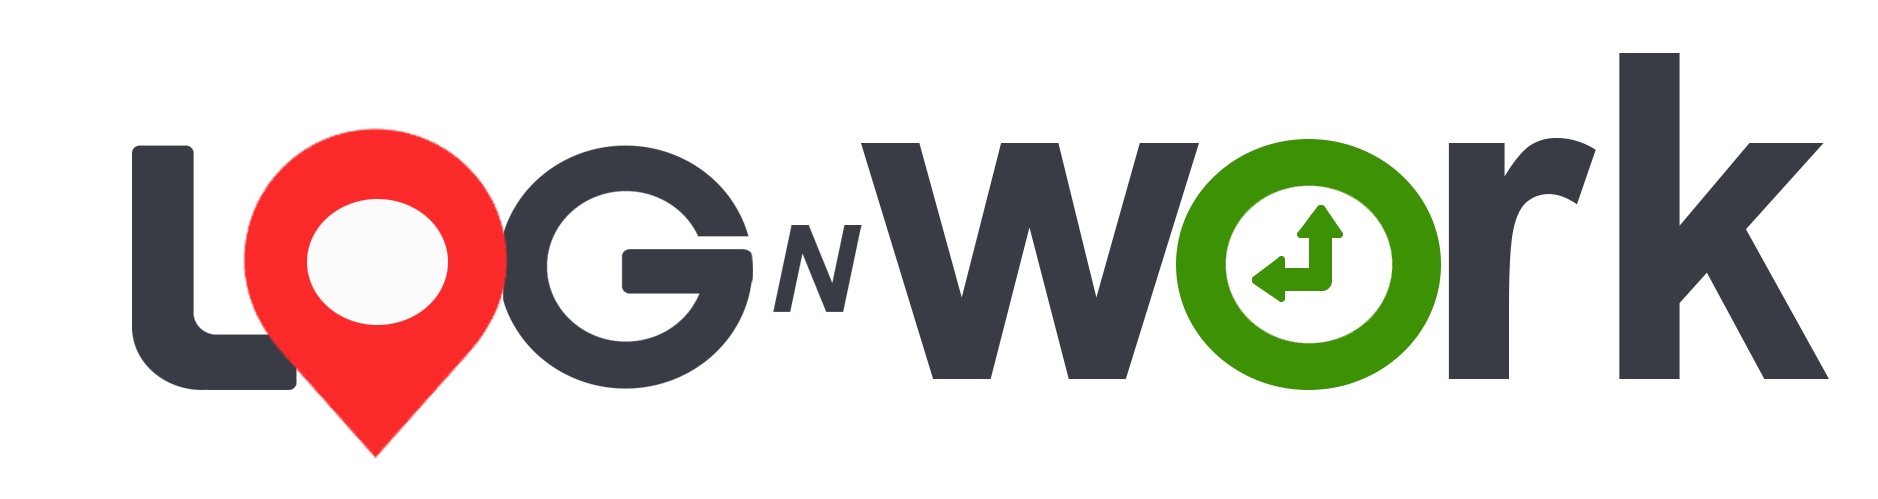 LogNWork logo